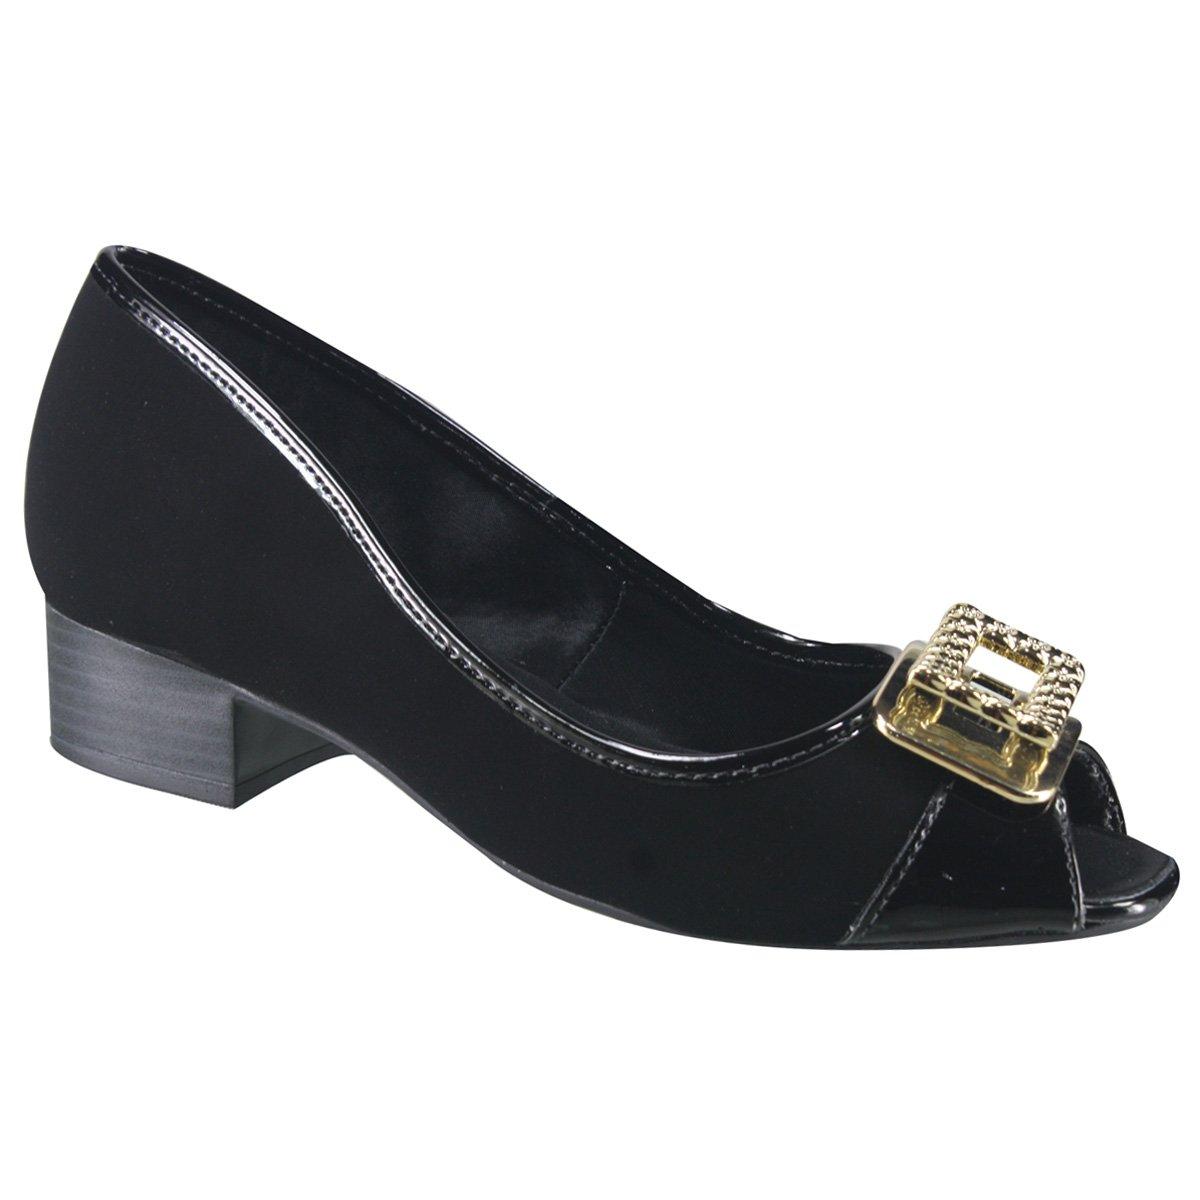 d796b61c76 Sapato Feminino Ramarim Total Comfort Peep Toe 17-92205 000004 ...